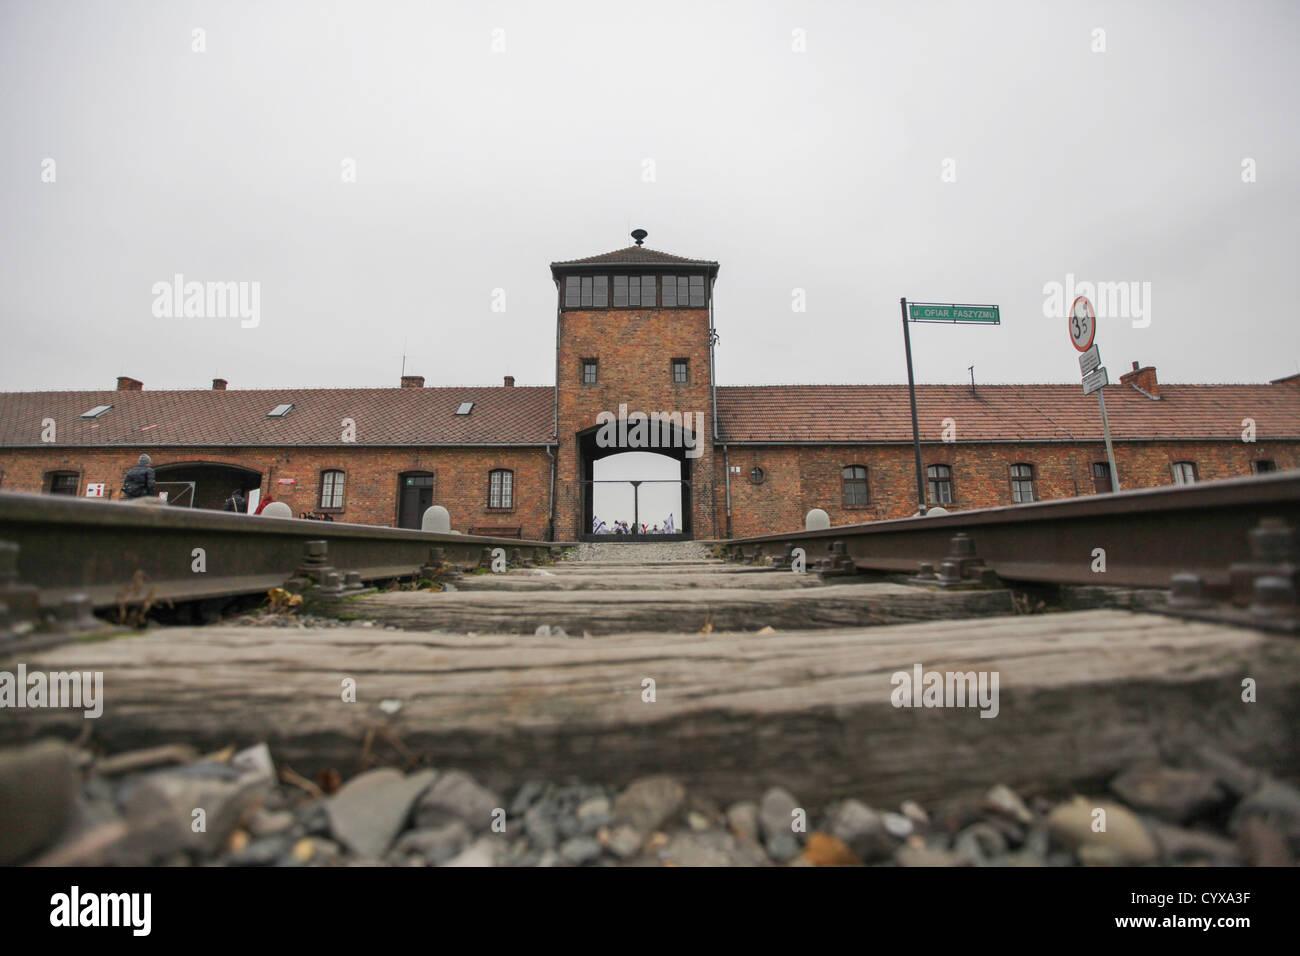 Nazi Auschwitz Extermination Camp, Poland. The railway tracks - Stock Image